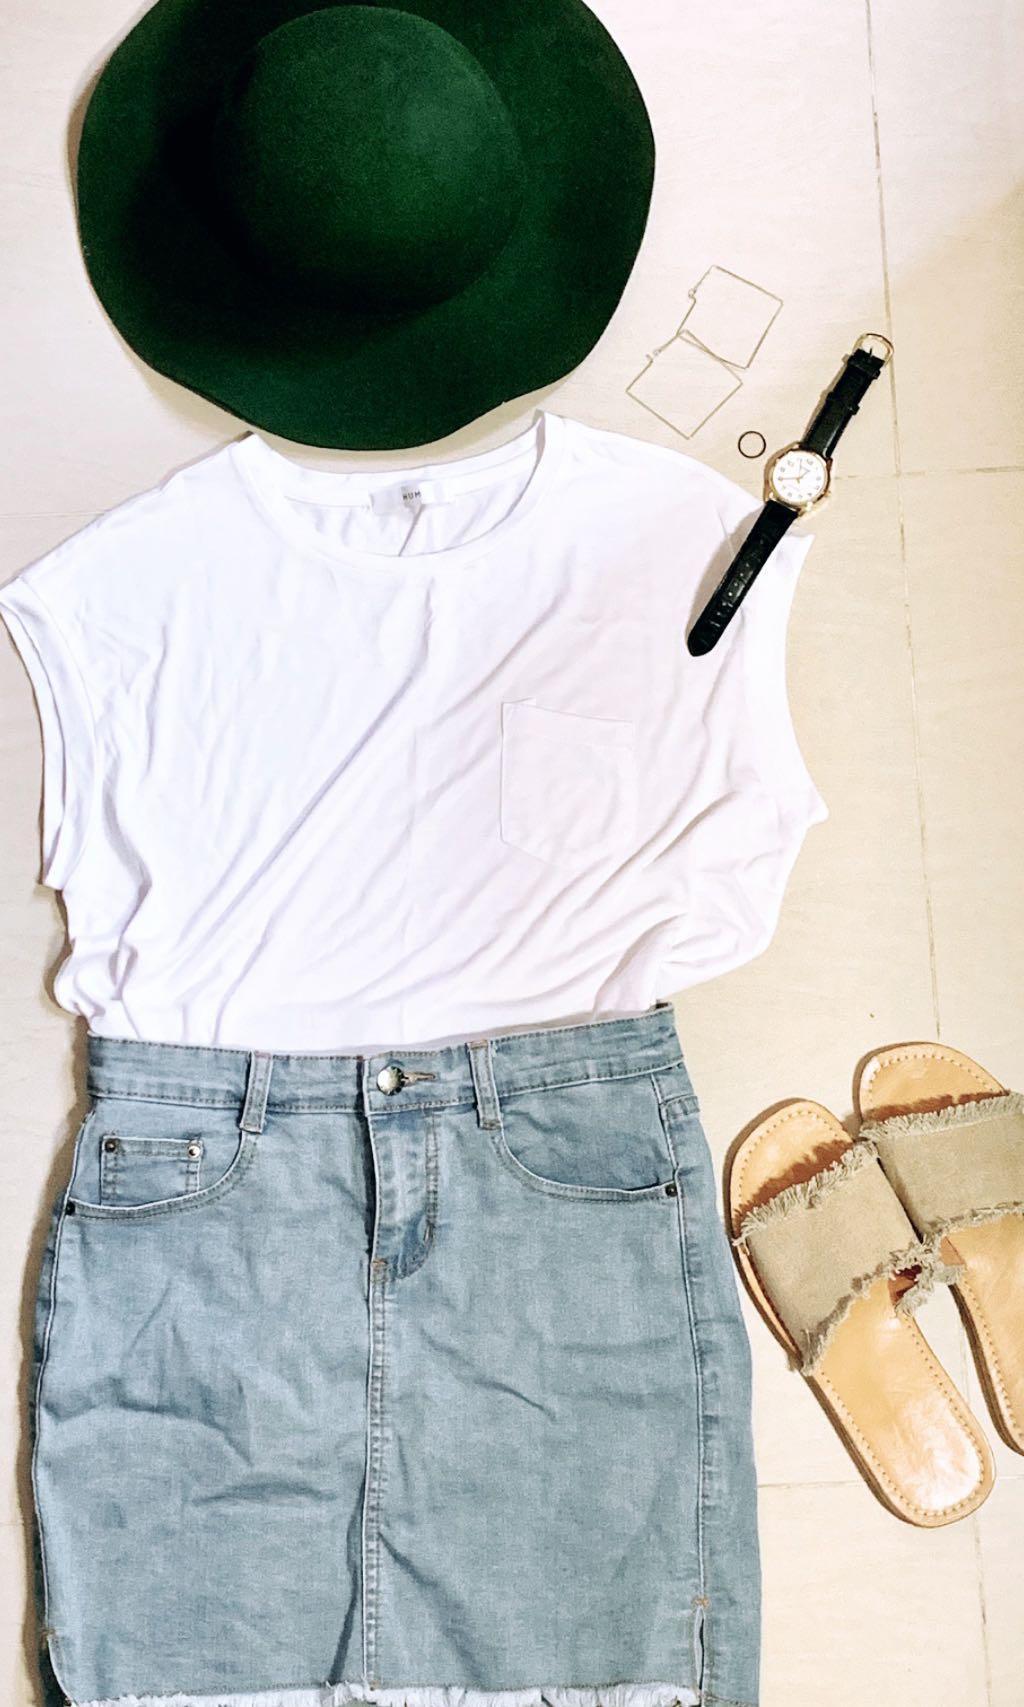 Simple white tank top